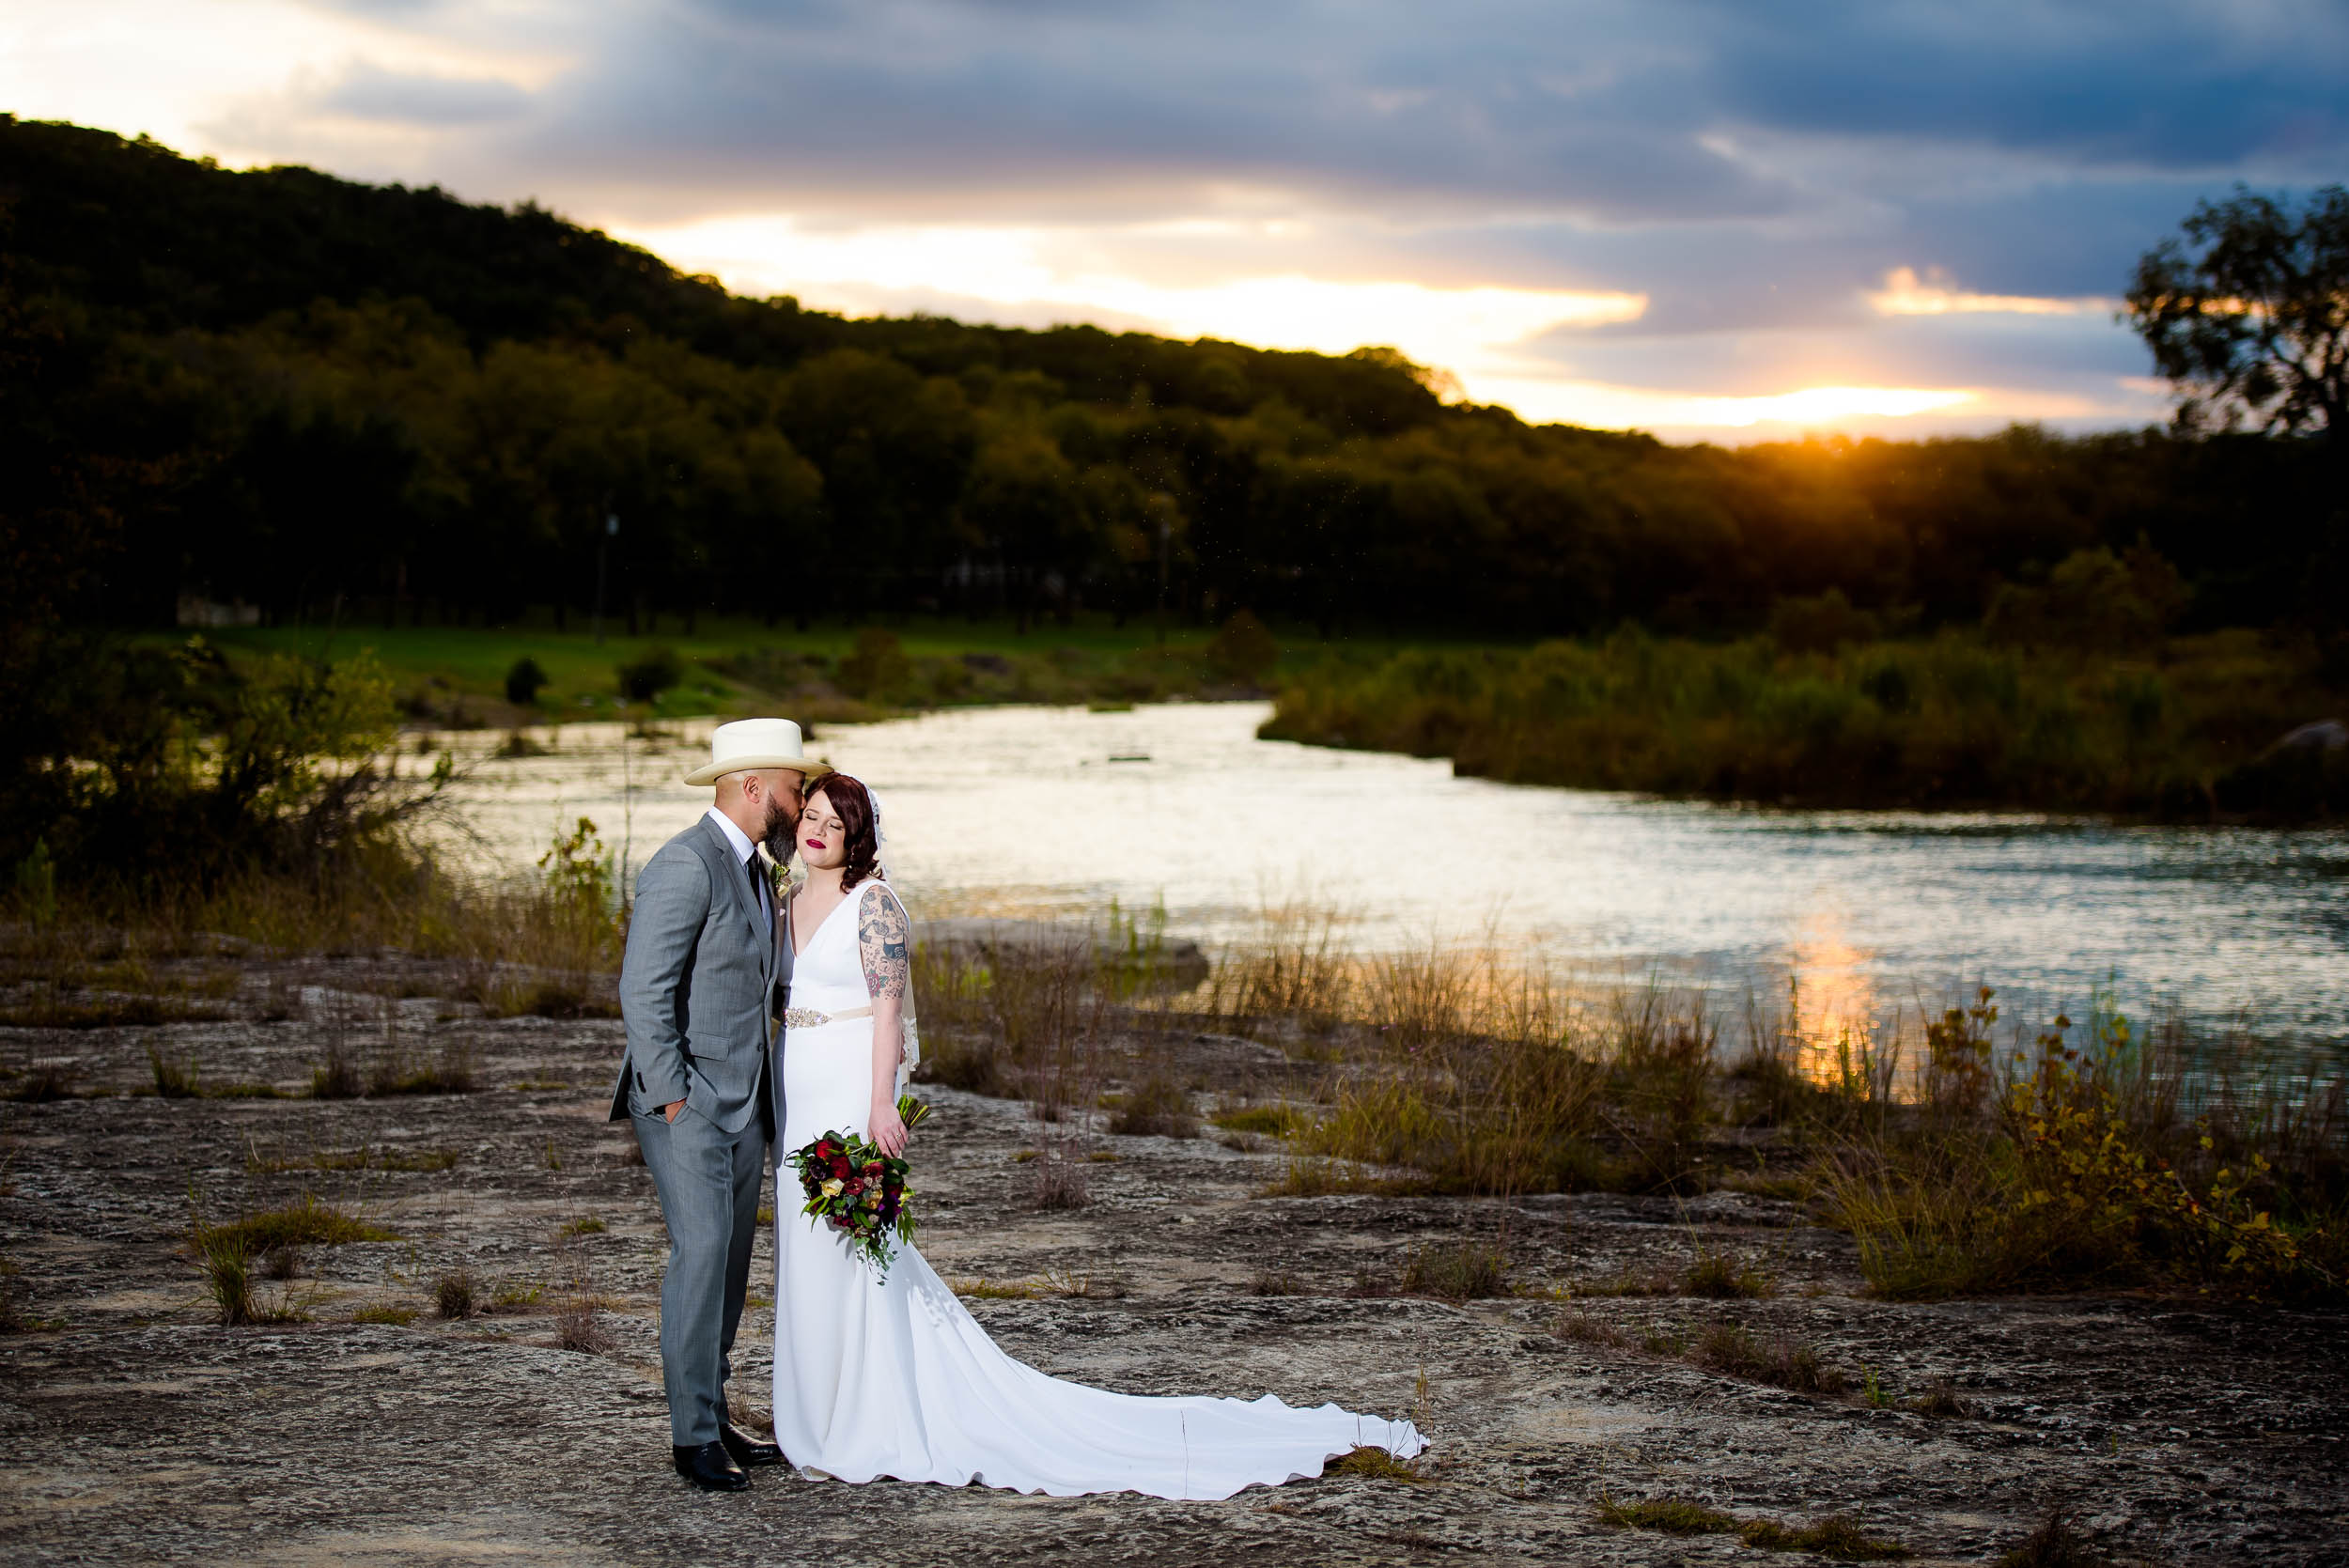 Sunset wedding photo during a Montesino Ranch wedding Austin, Texas.